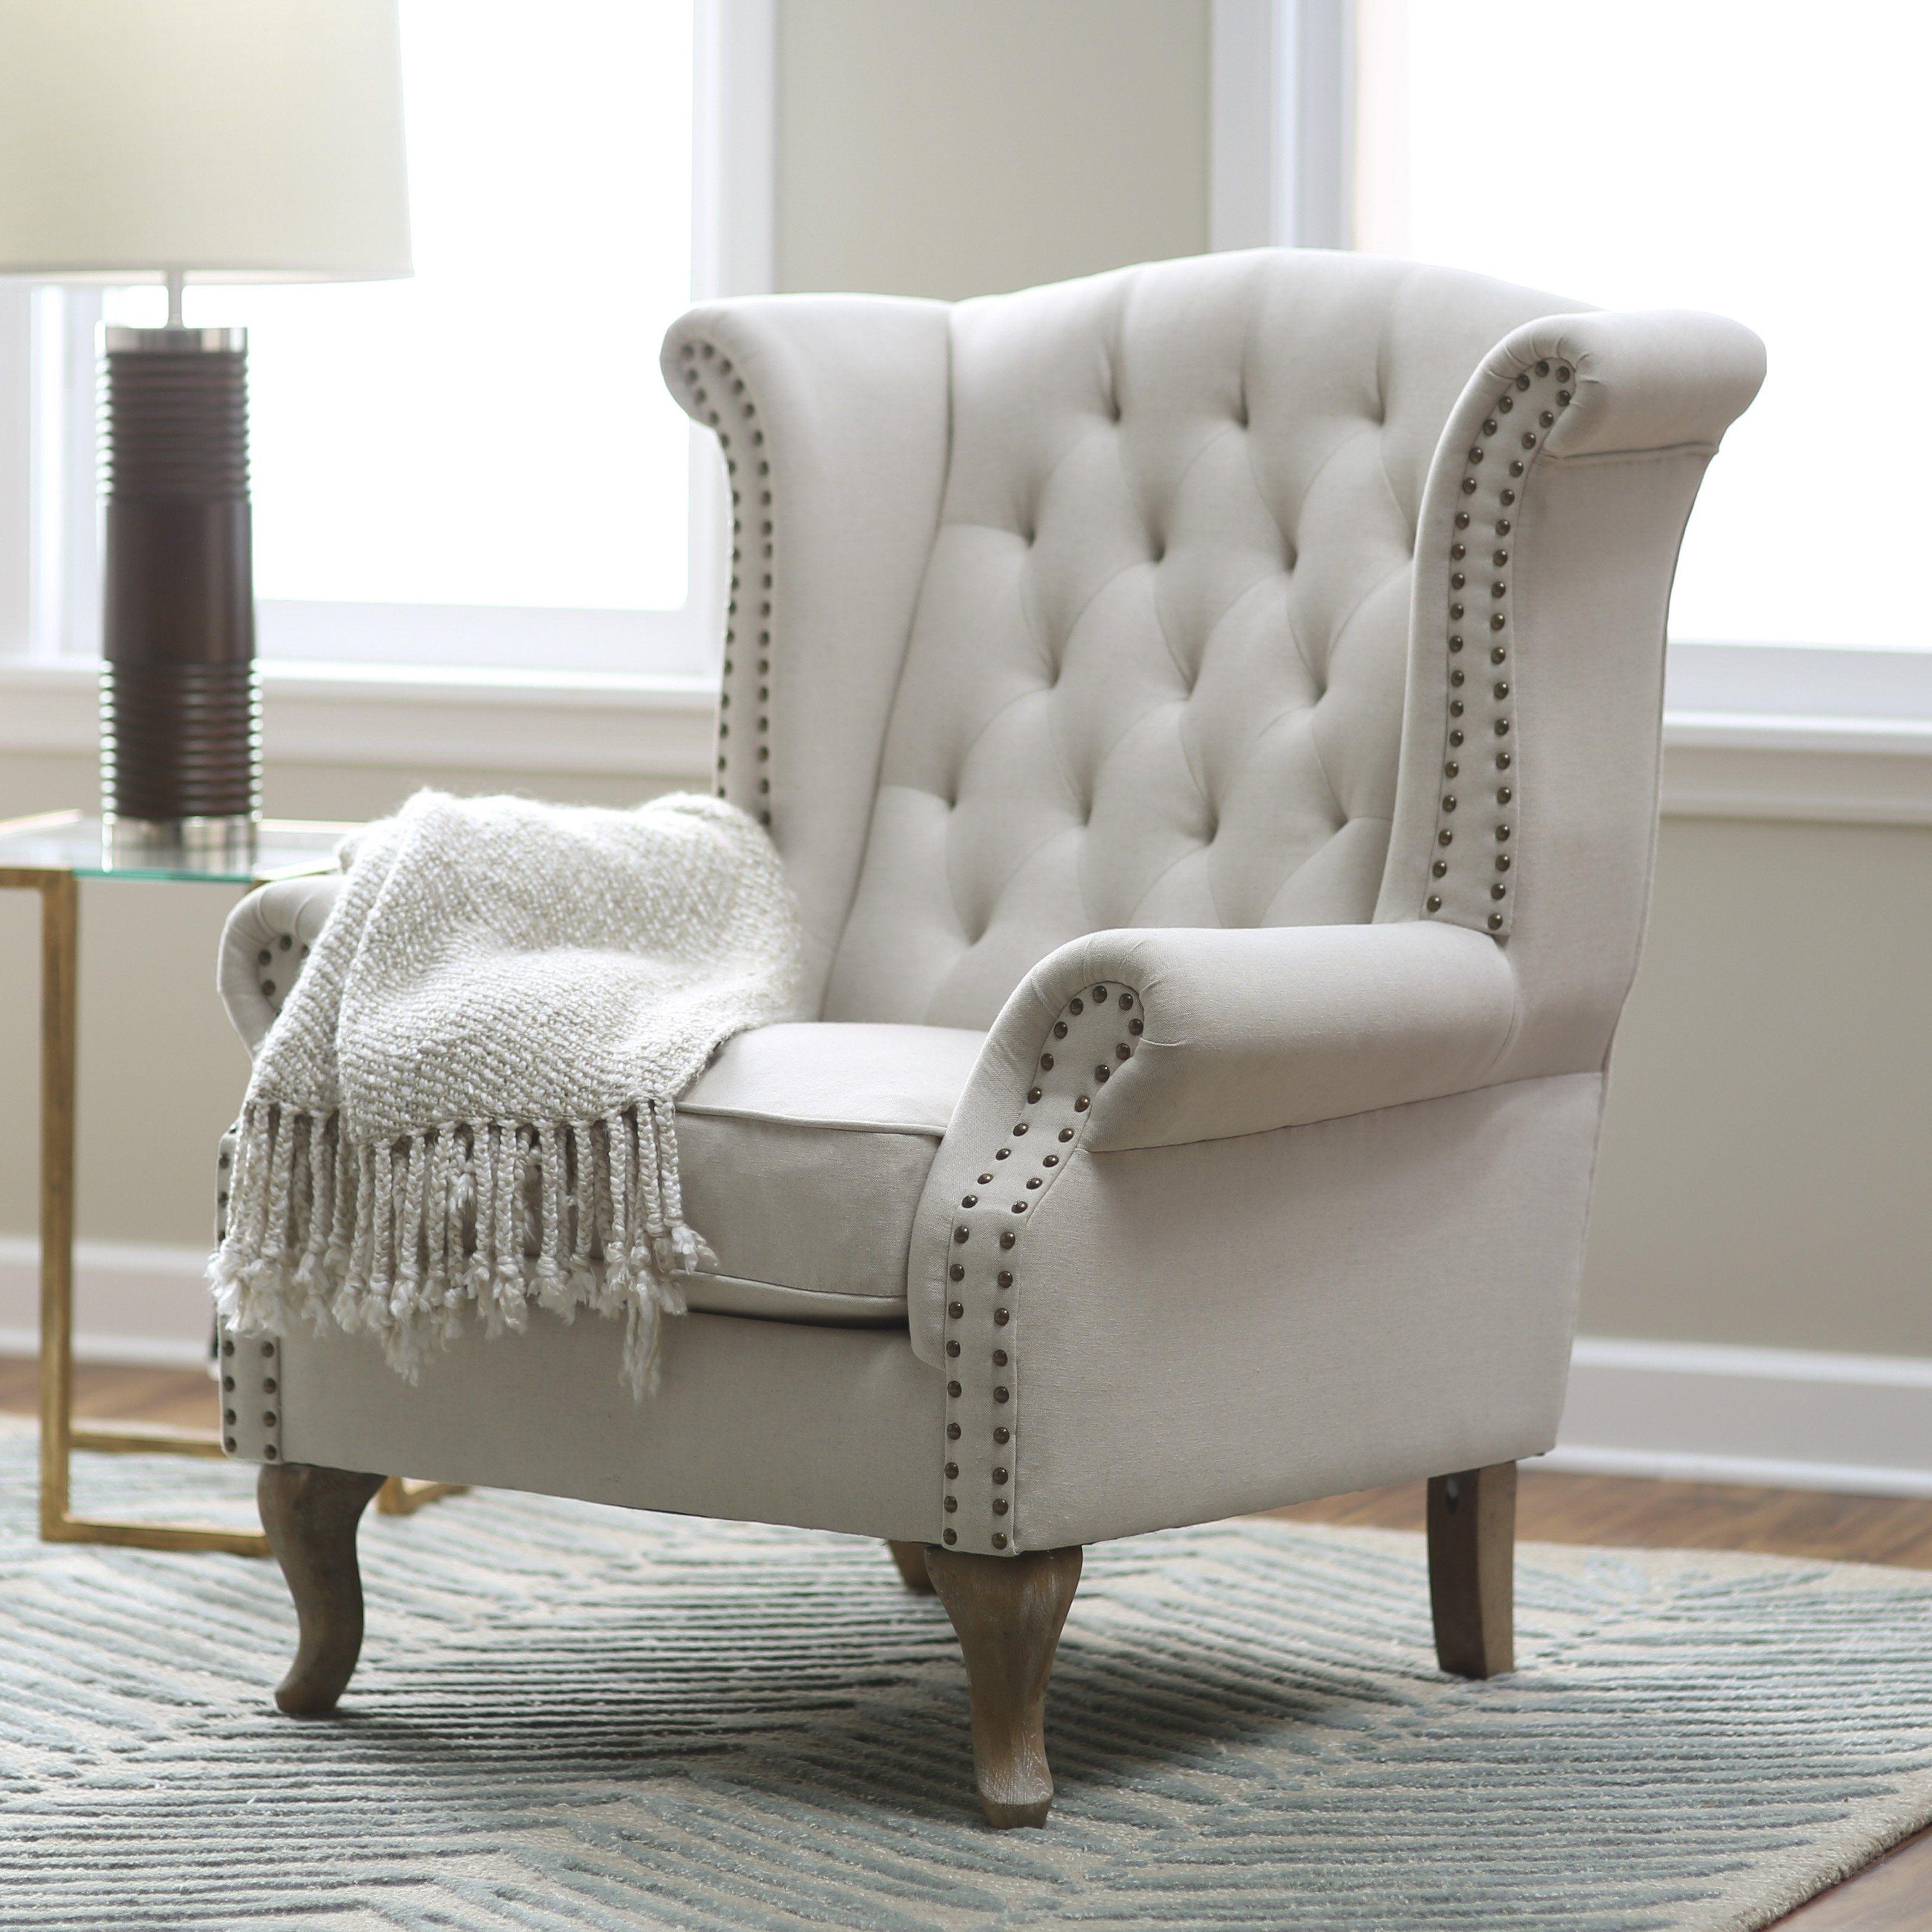 Belham Living Tatum Tufted Arm Chair with Nailheads Beige ...